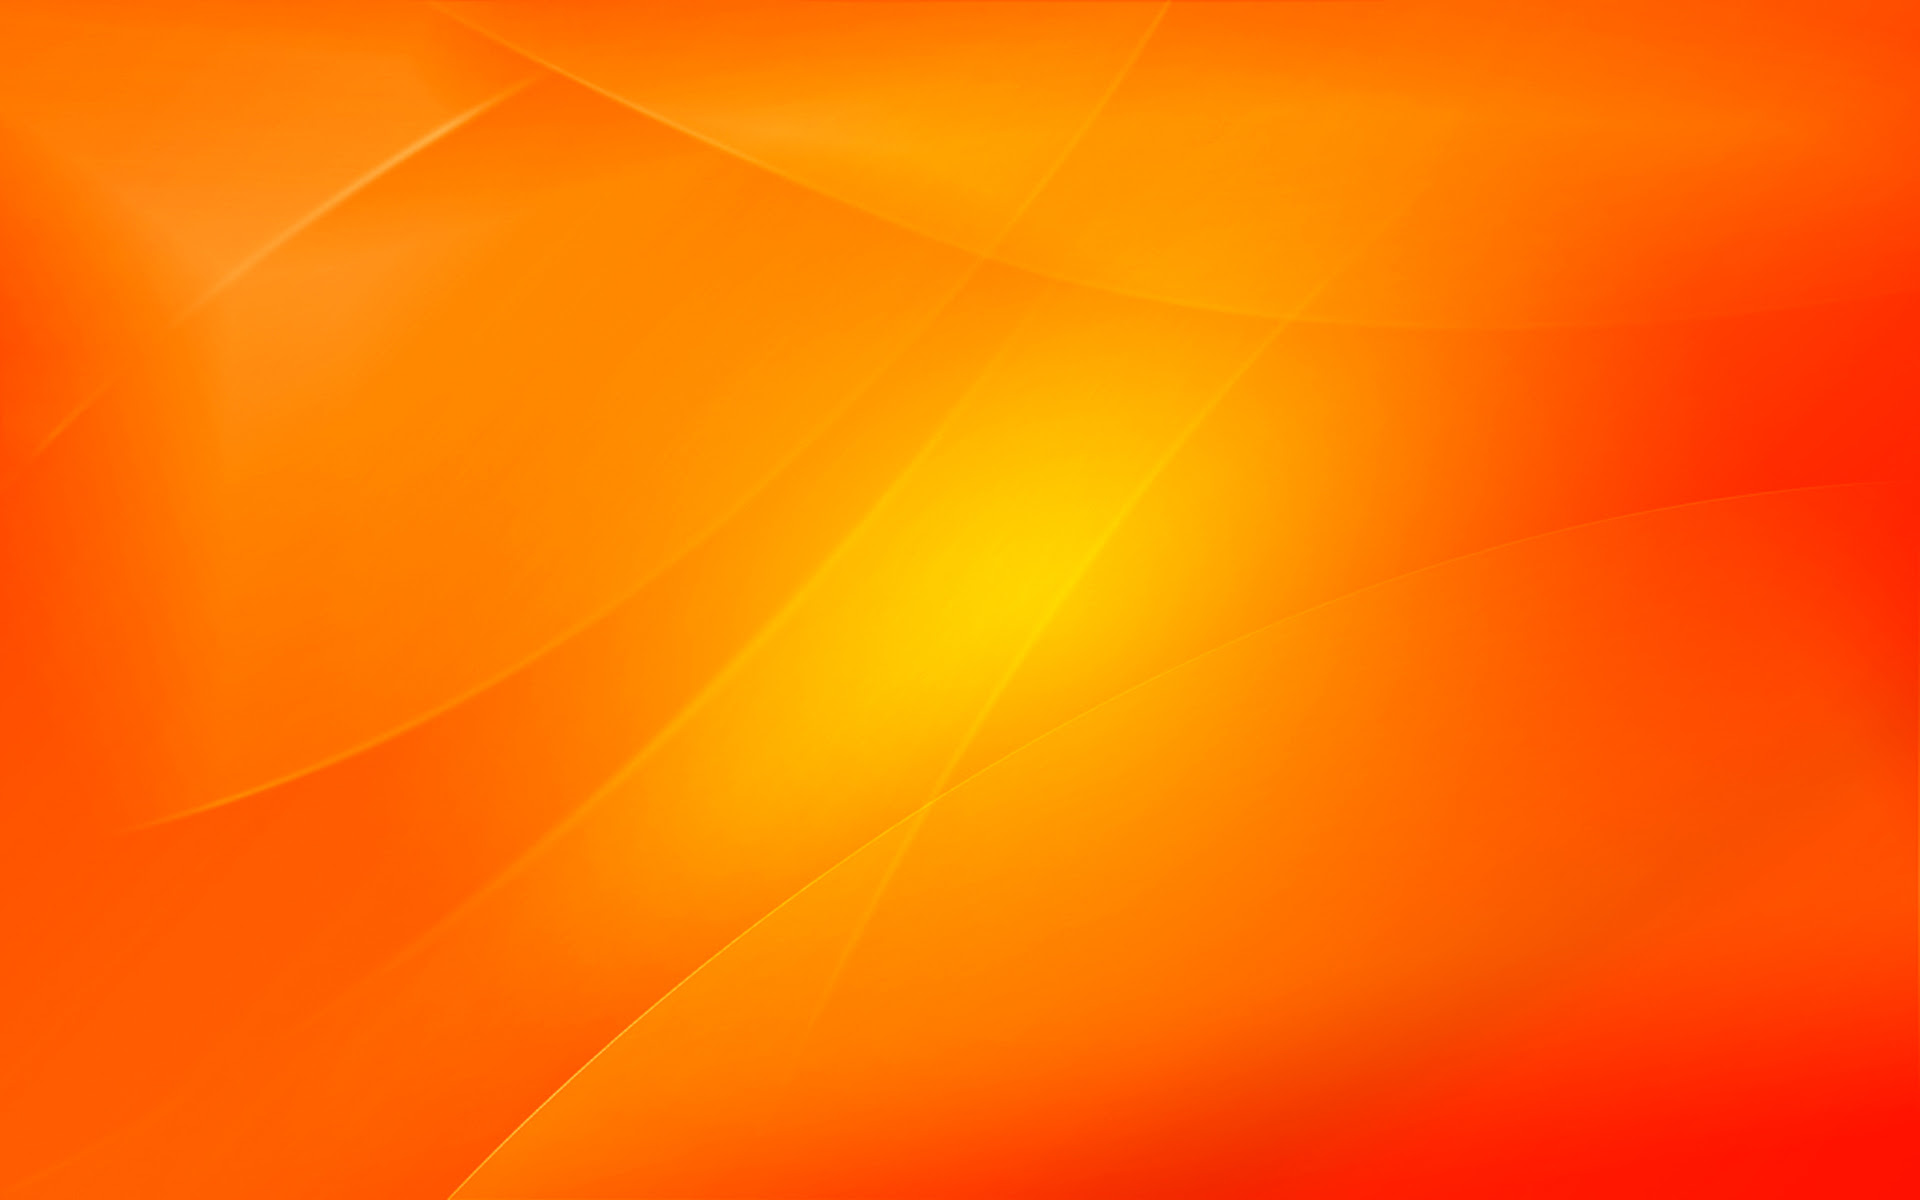 Background Powerpoint Warna Orange Koleksi Gambar HD